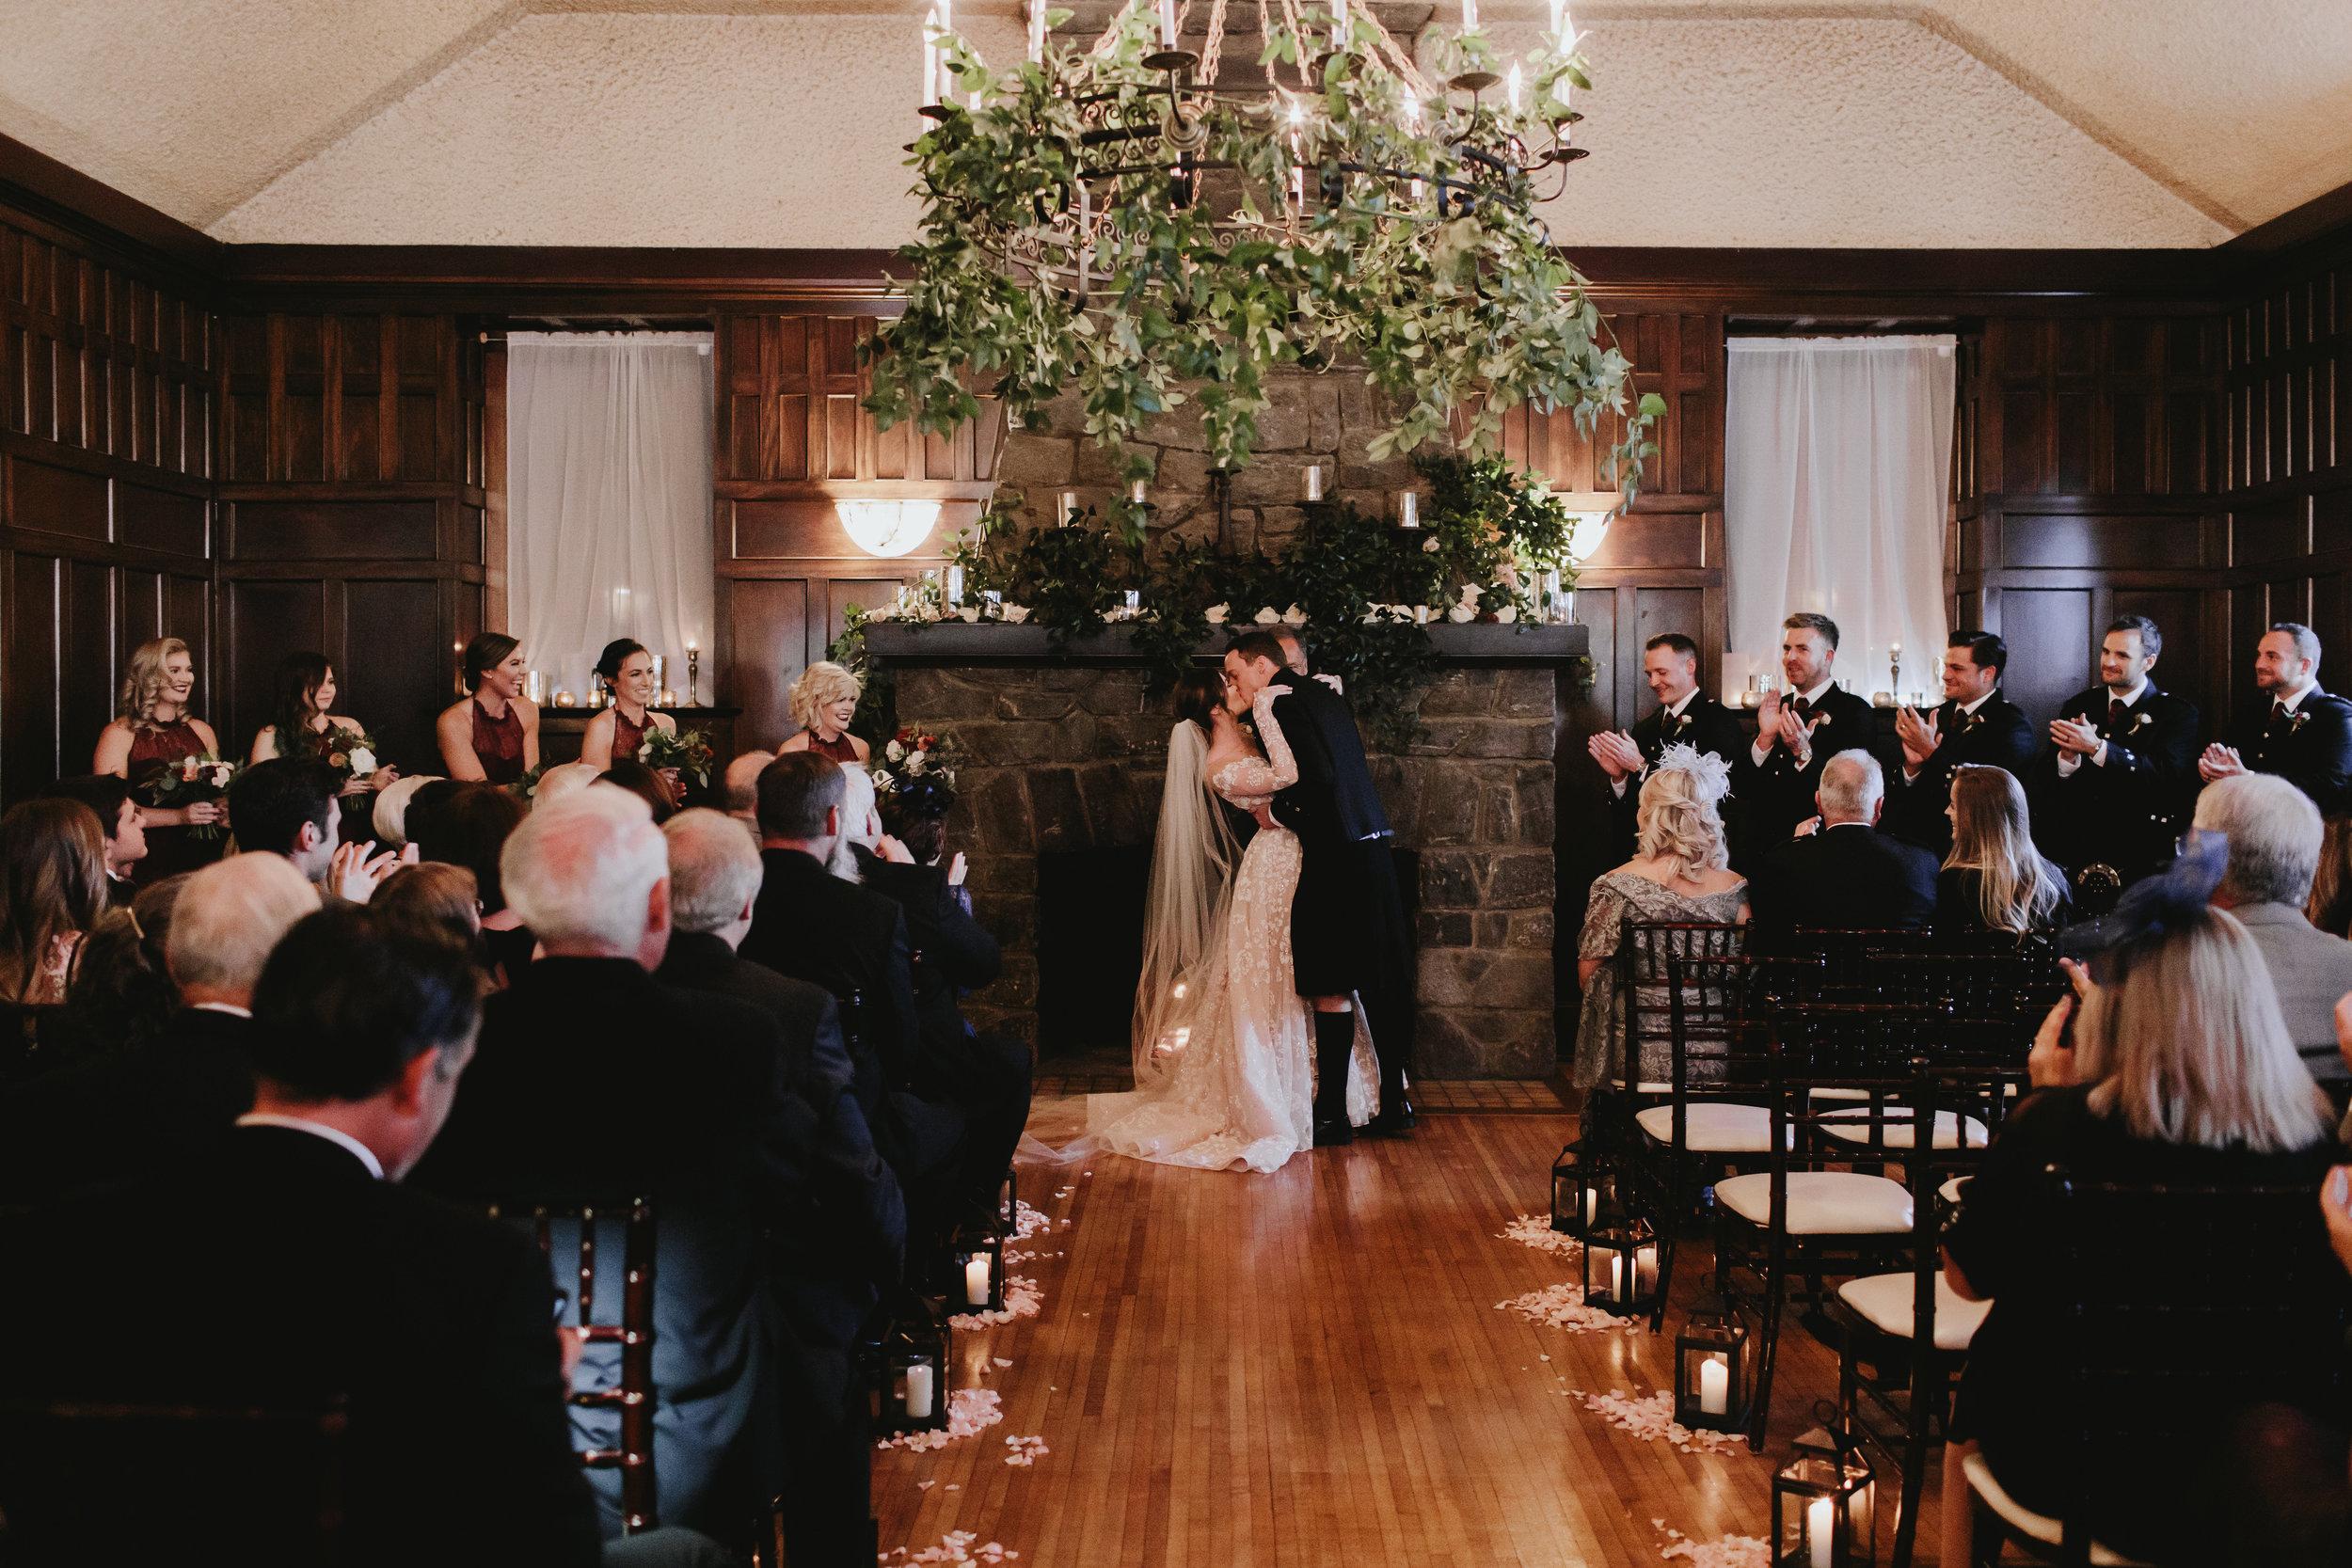 indoor wedding kiss the bride -Bryson Wedding - Alicia White Photography-221.jpg